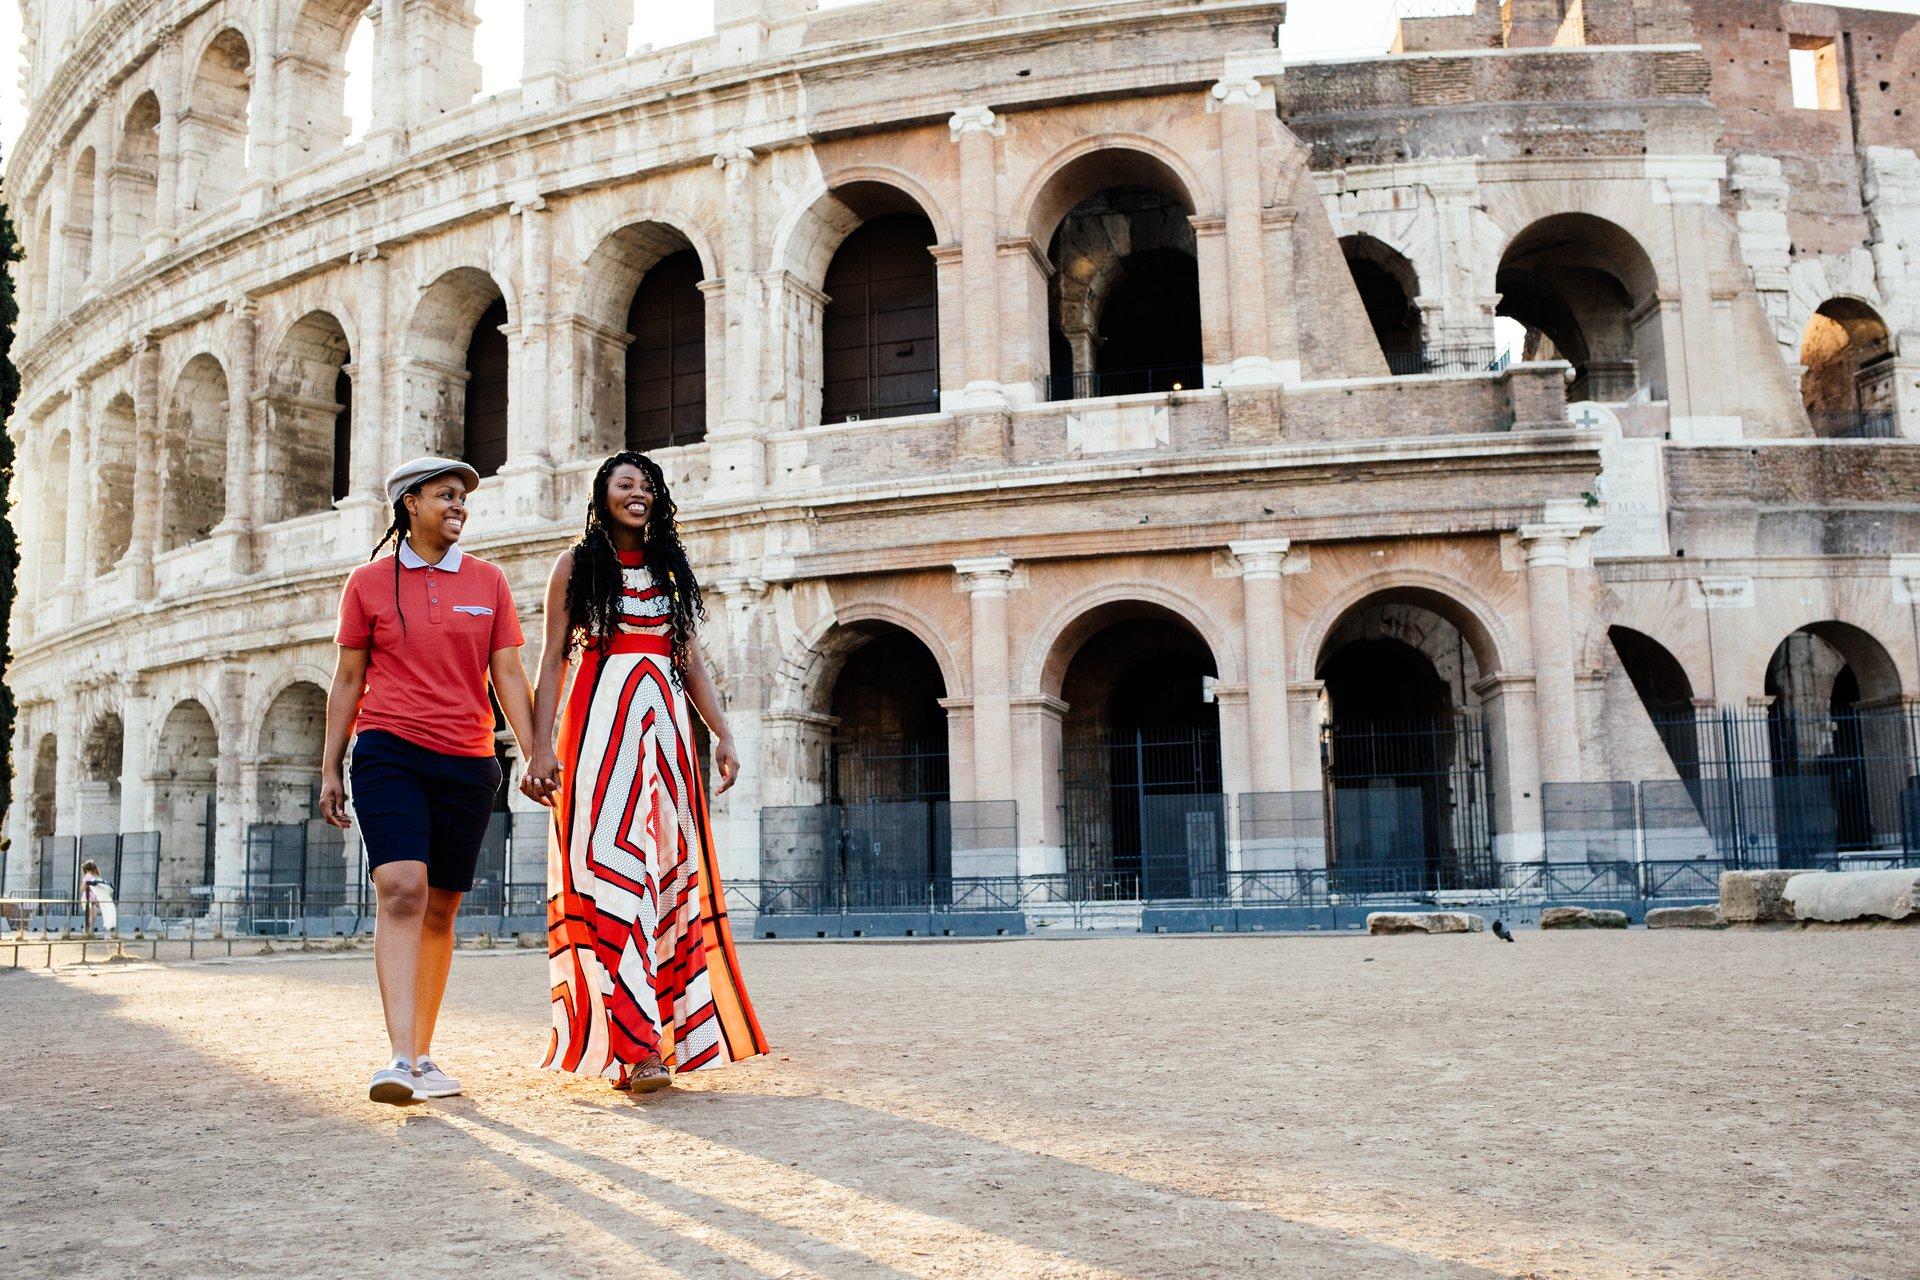 Rome-Italy-travel-story-Flytographer-51